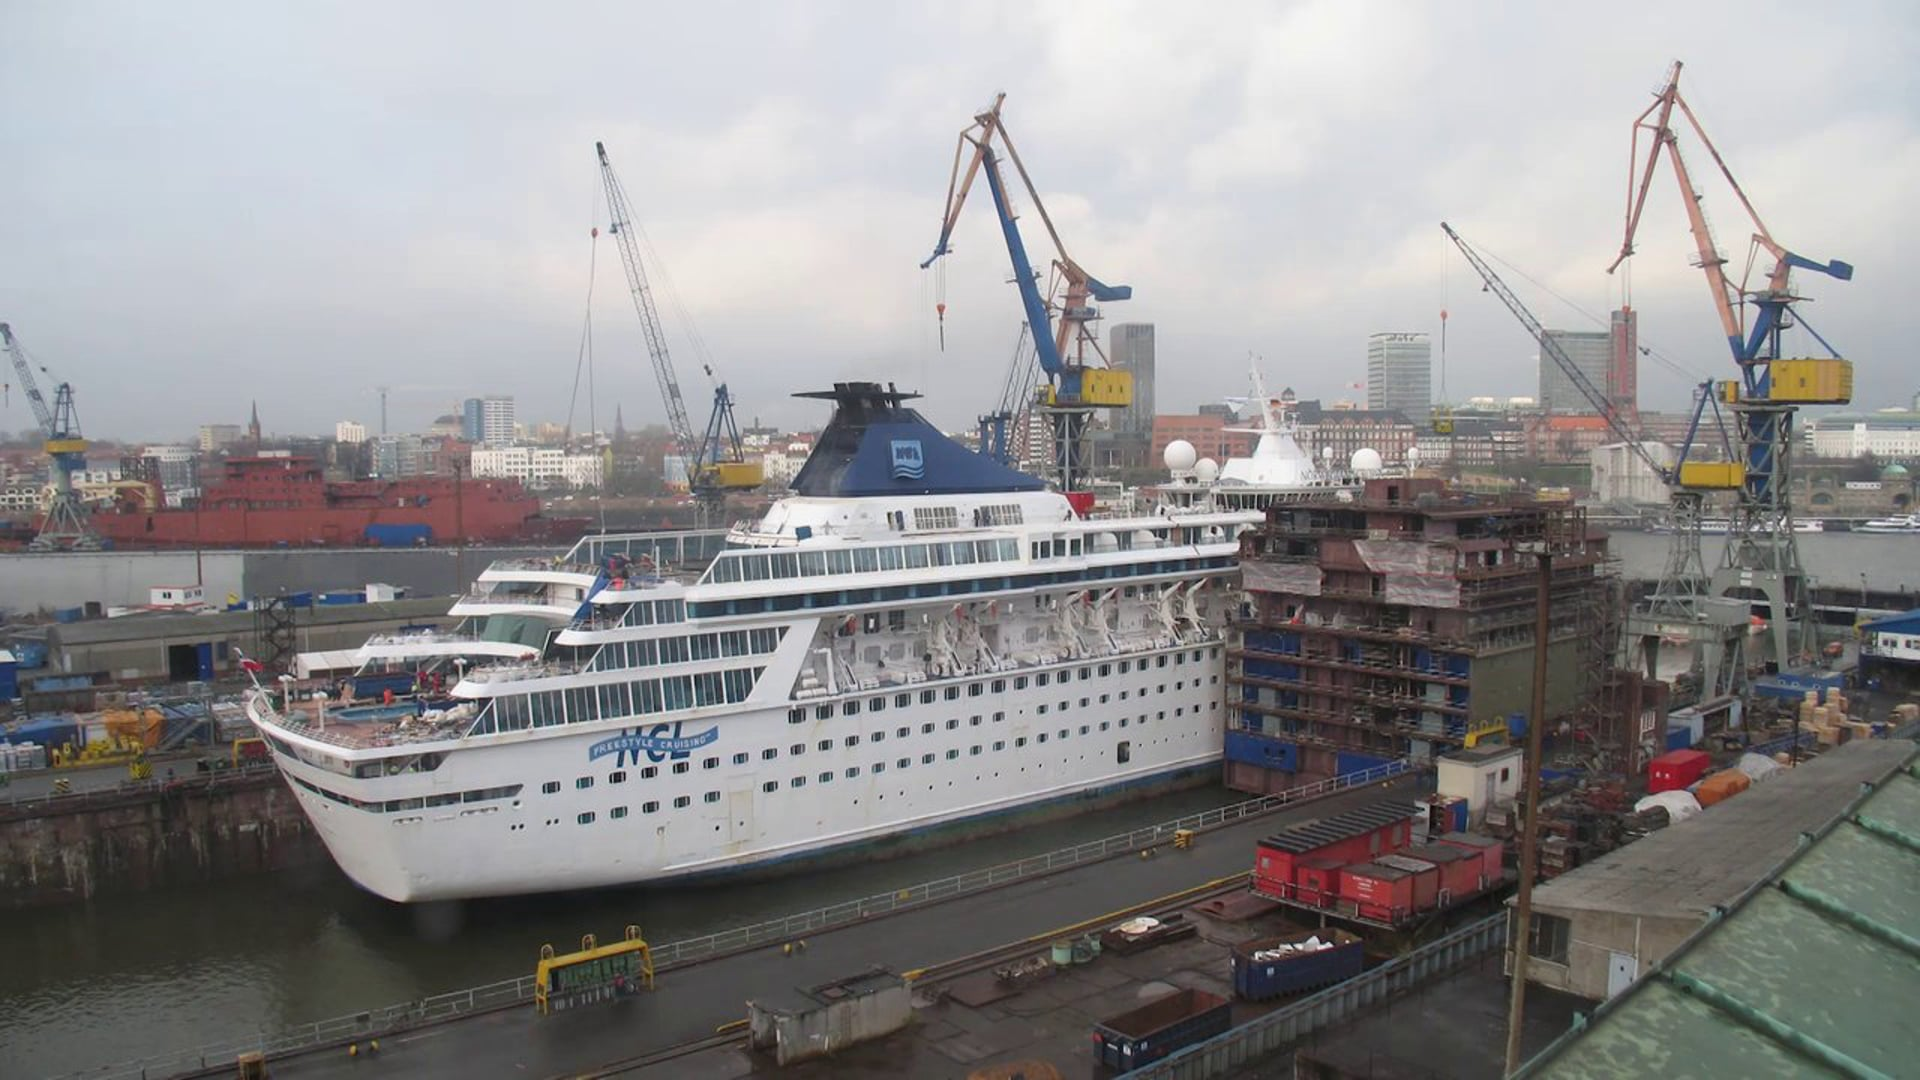 Balmoral timelapse at Blohm+Voss shipyard